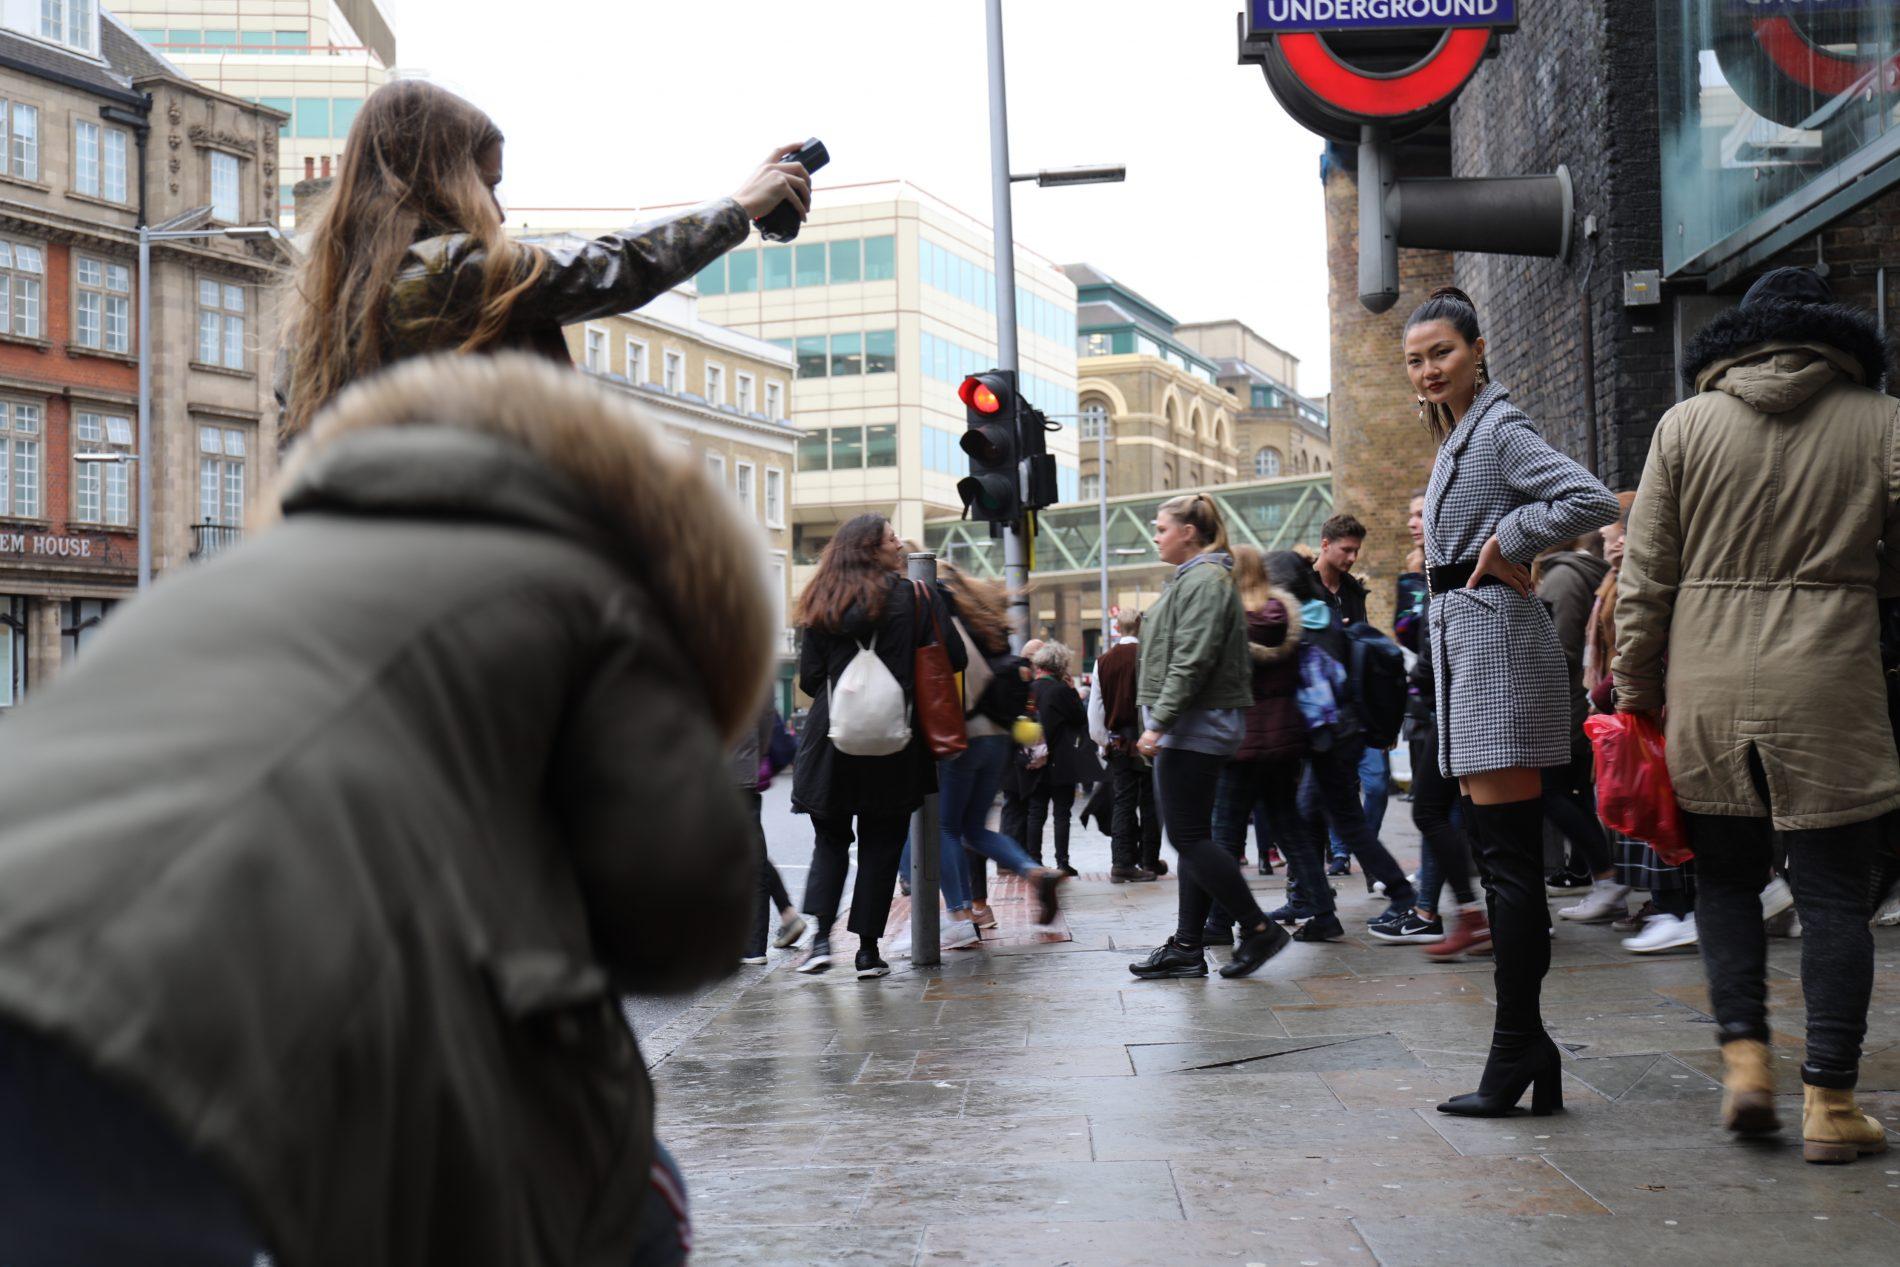 london fashion video videografie fotografie - RSDesigns